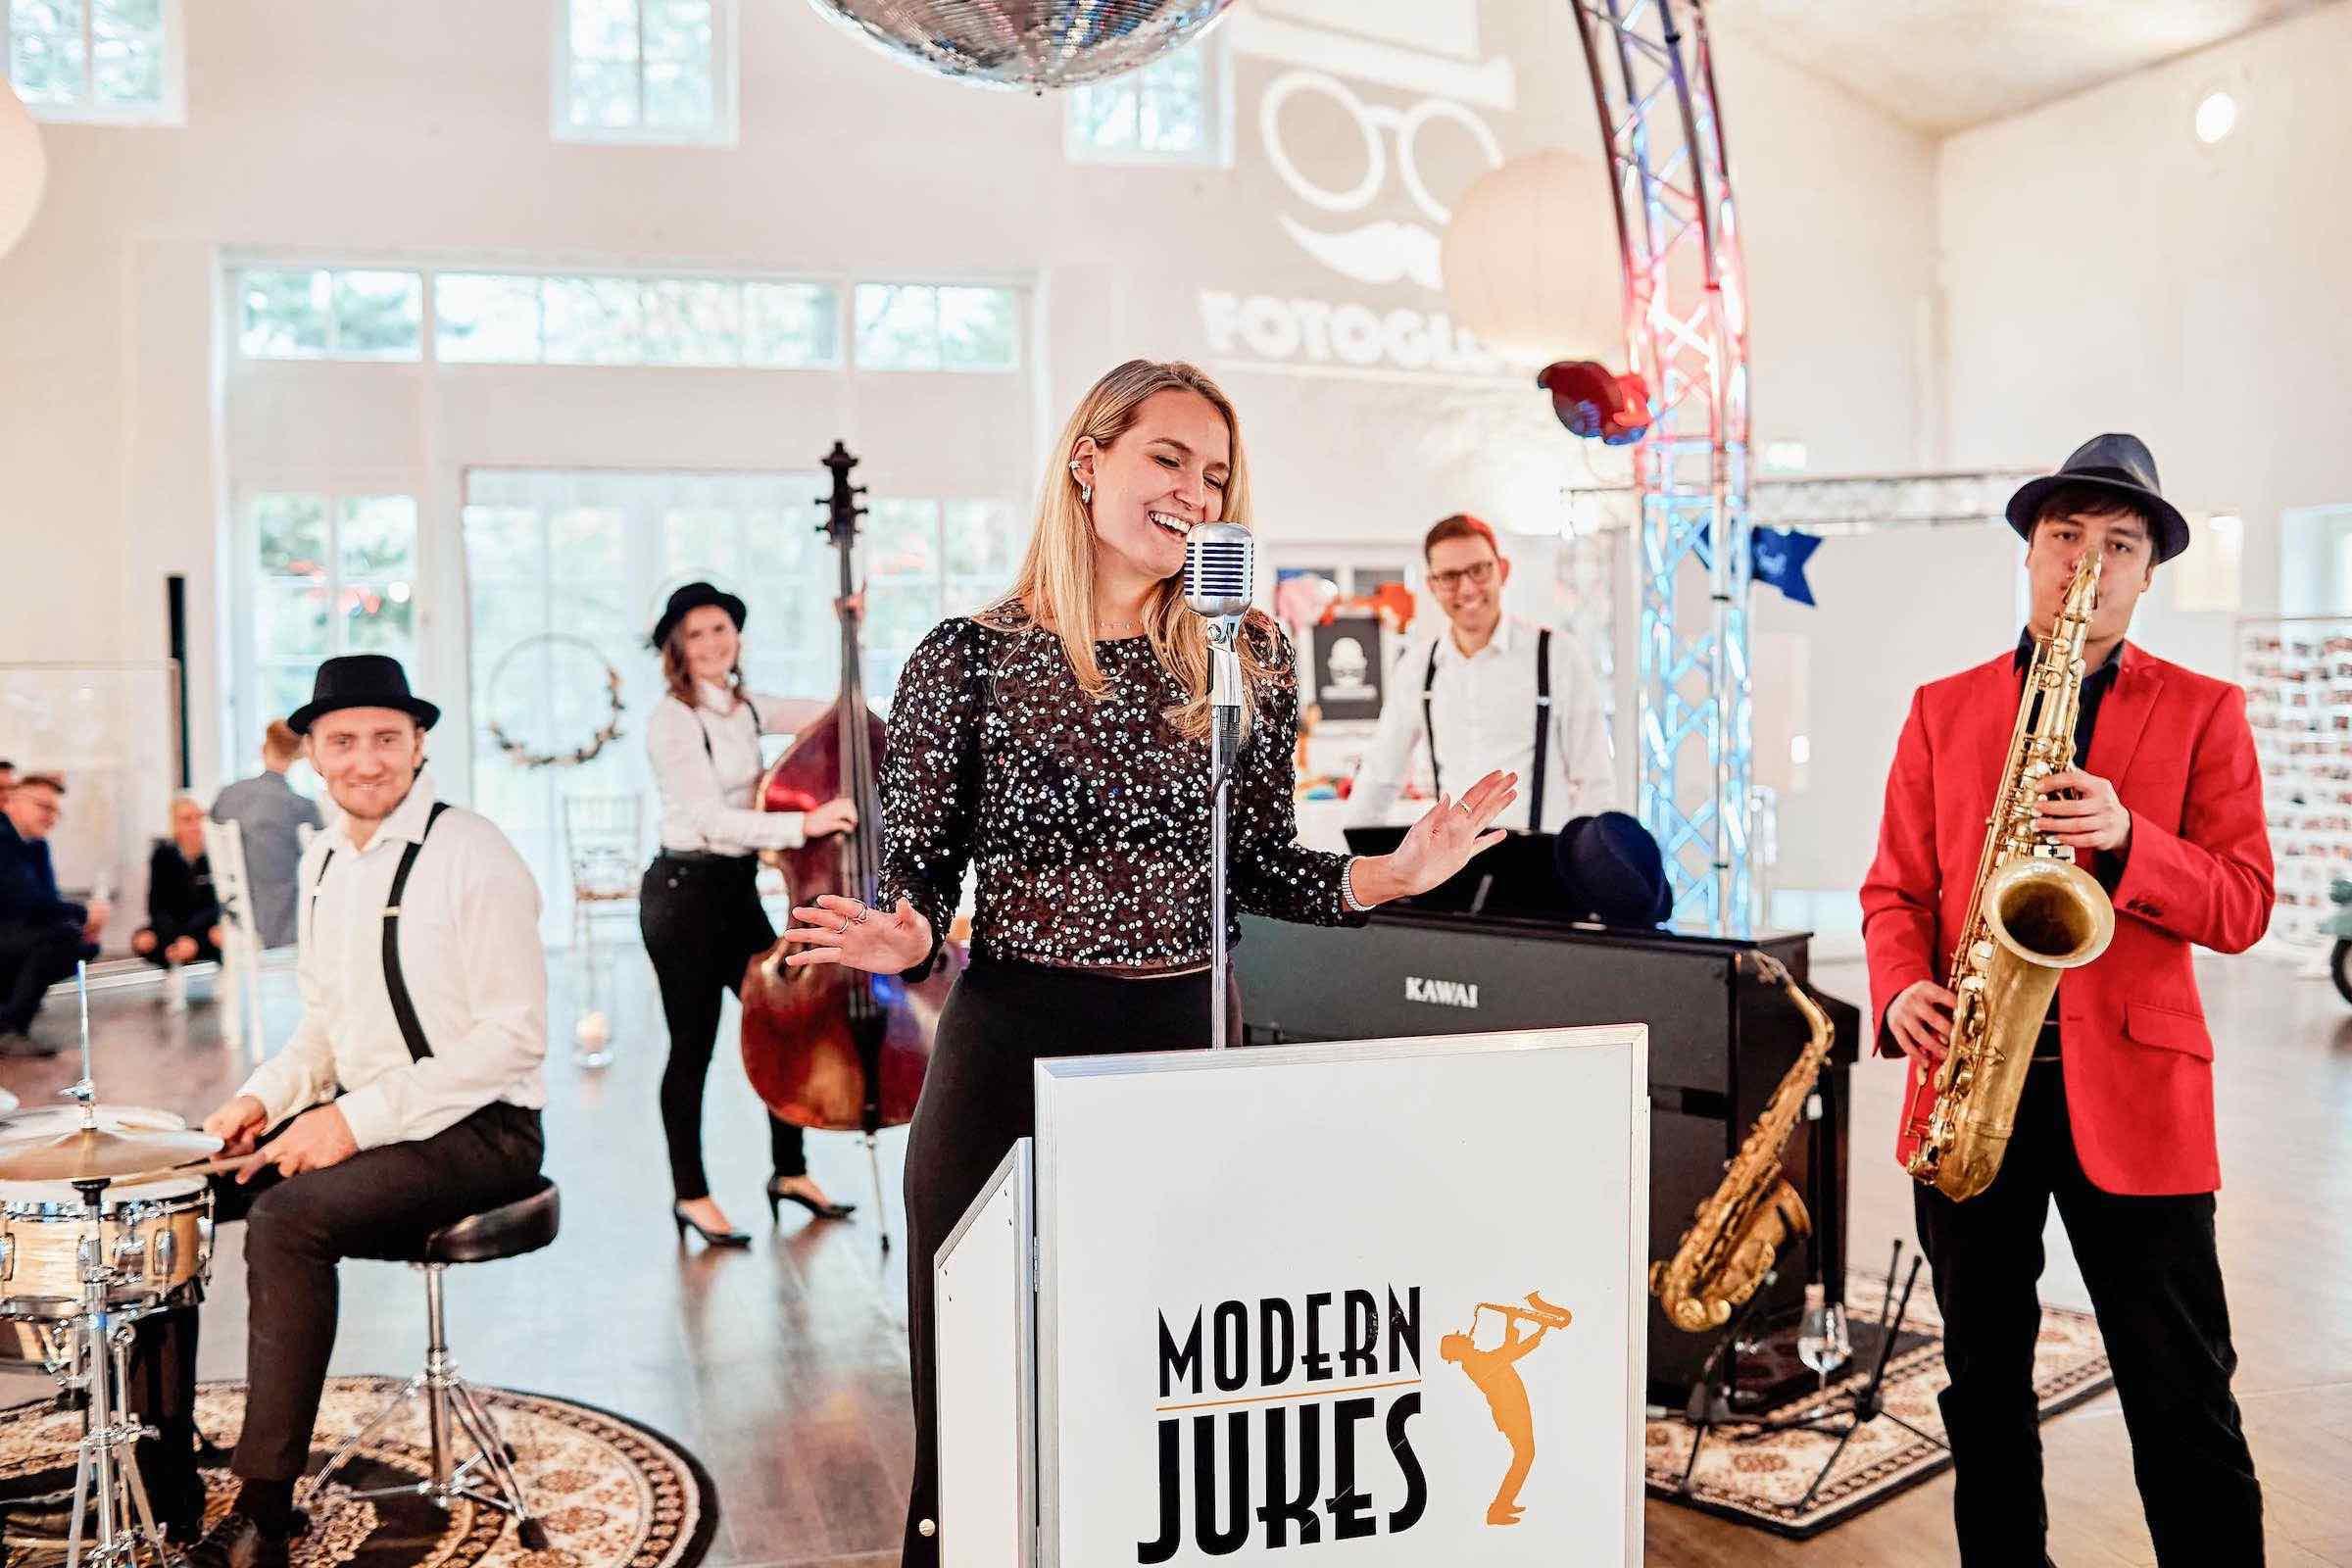 Partyband | Jazzband | Hamburg | Buchen | Band | Empfang | Sektempfang | Popband | Partyband | Sektempfang | Party | Trauung | Dinner | Buchen | Mieten | Hamburgfeiert